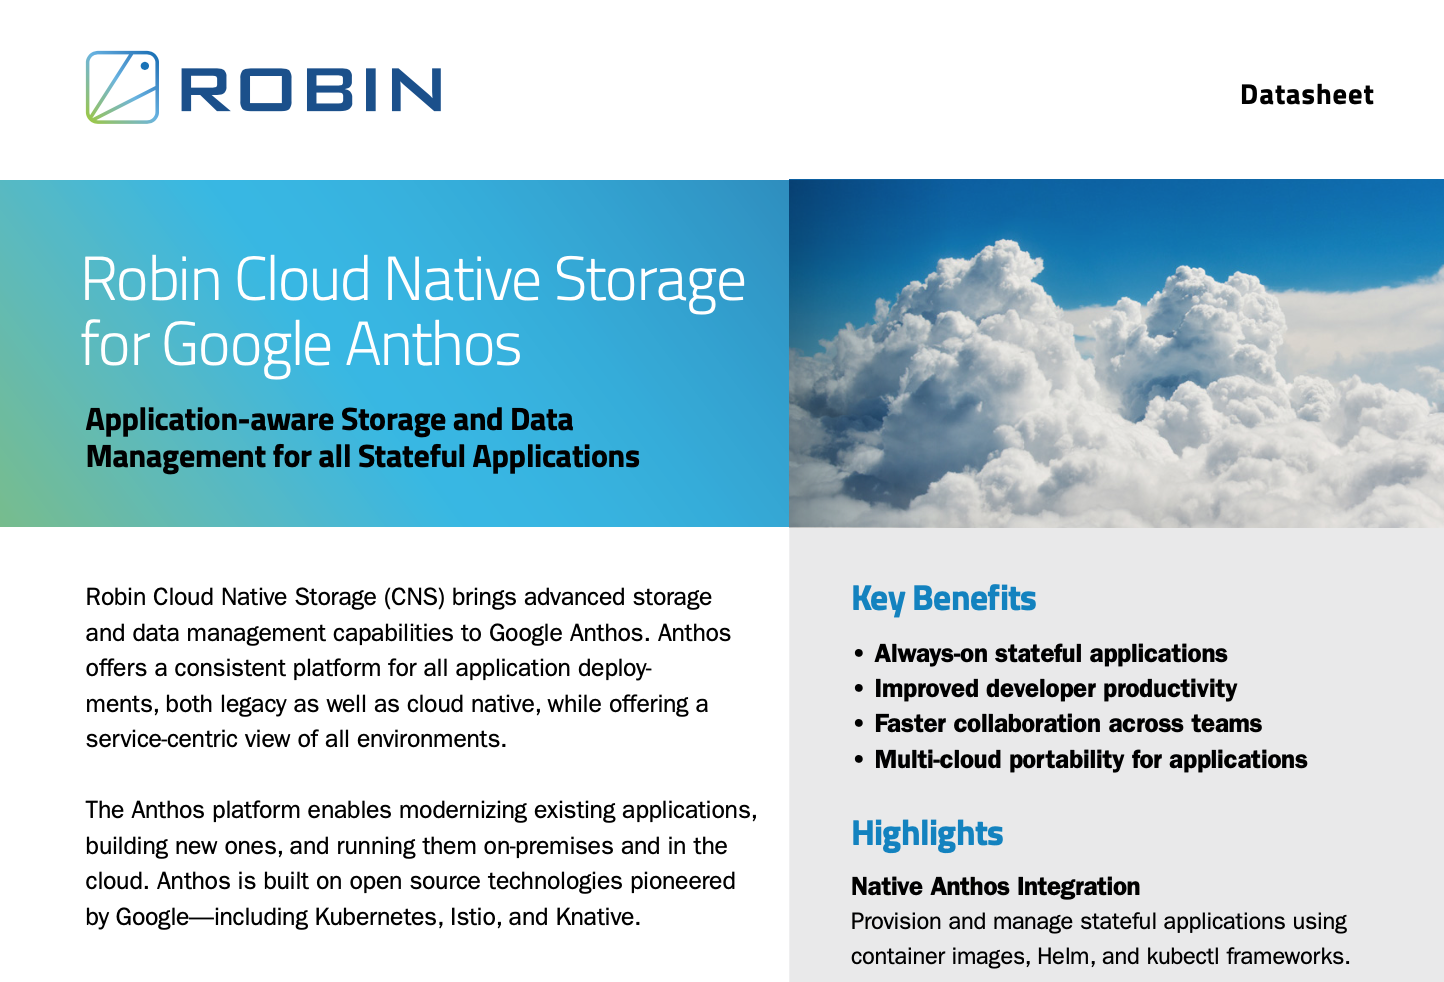 Robin Cloud Native Storage for Google Anthos